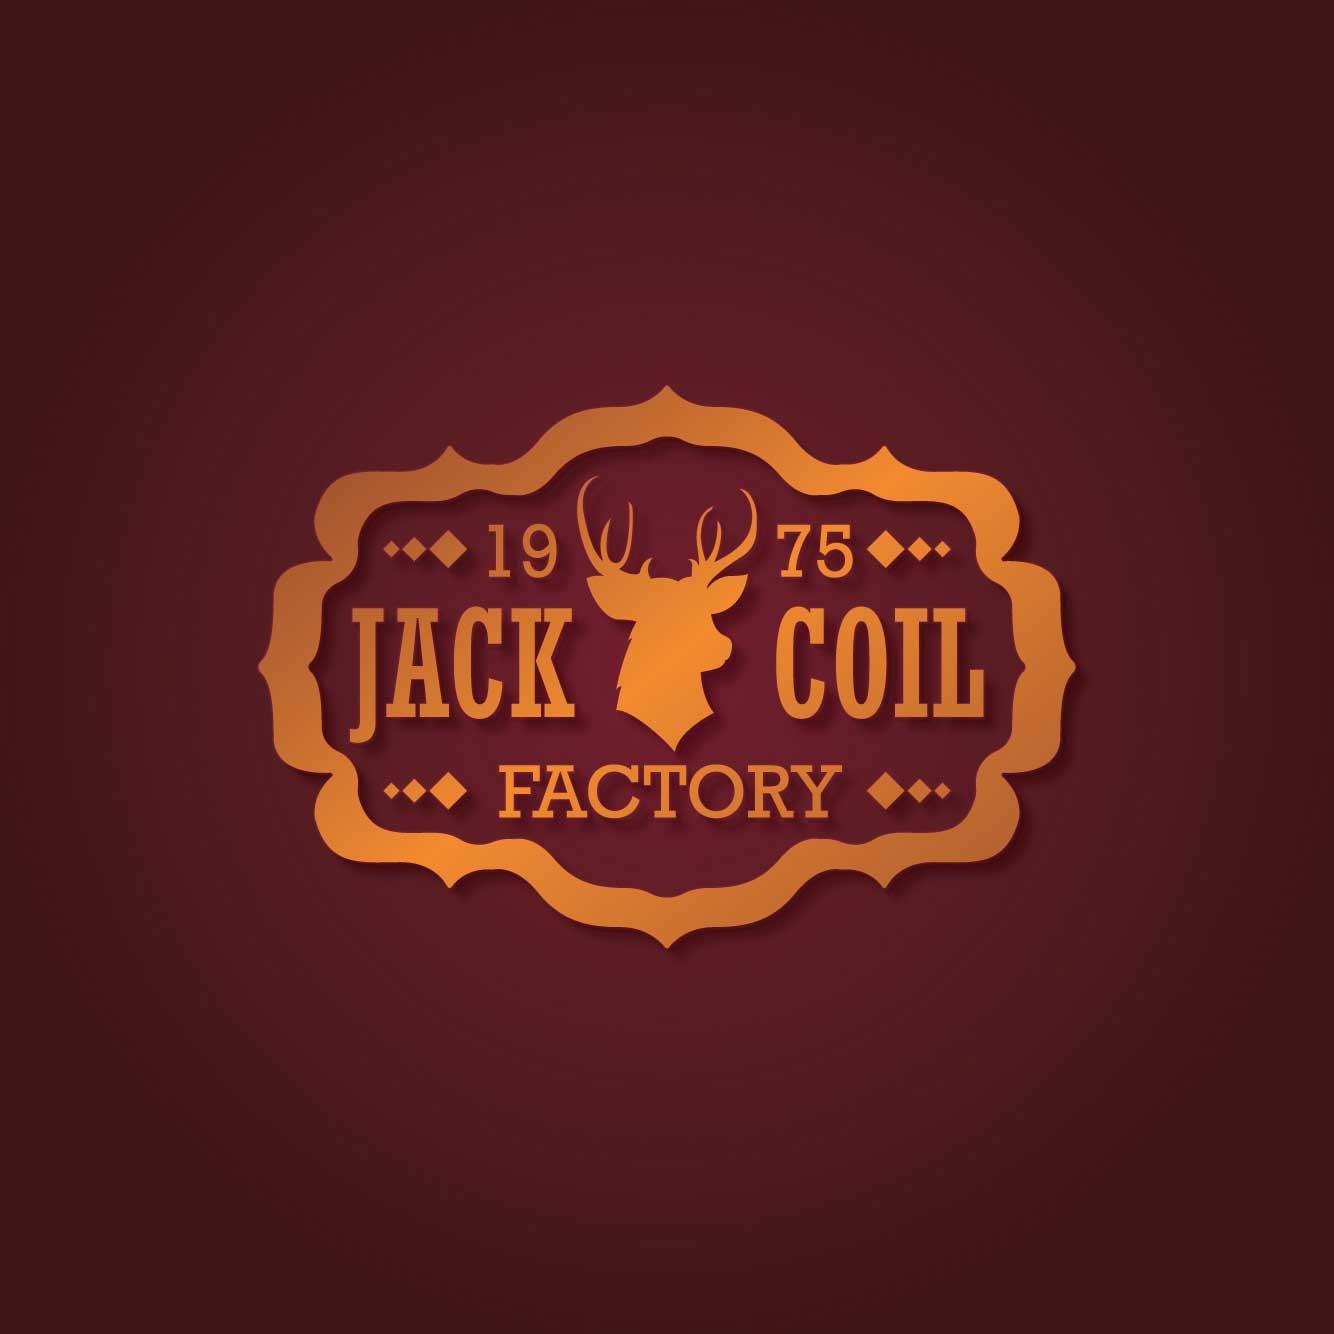 logo design service for Jack Coil Factory